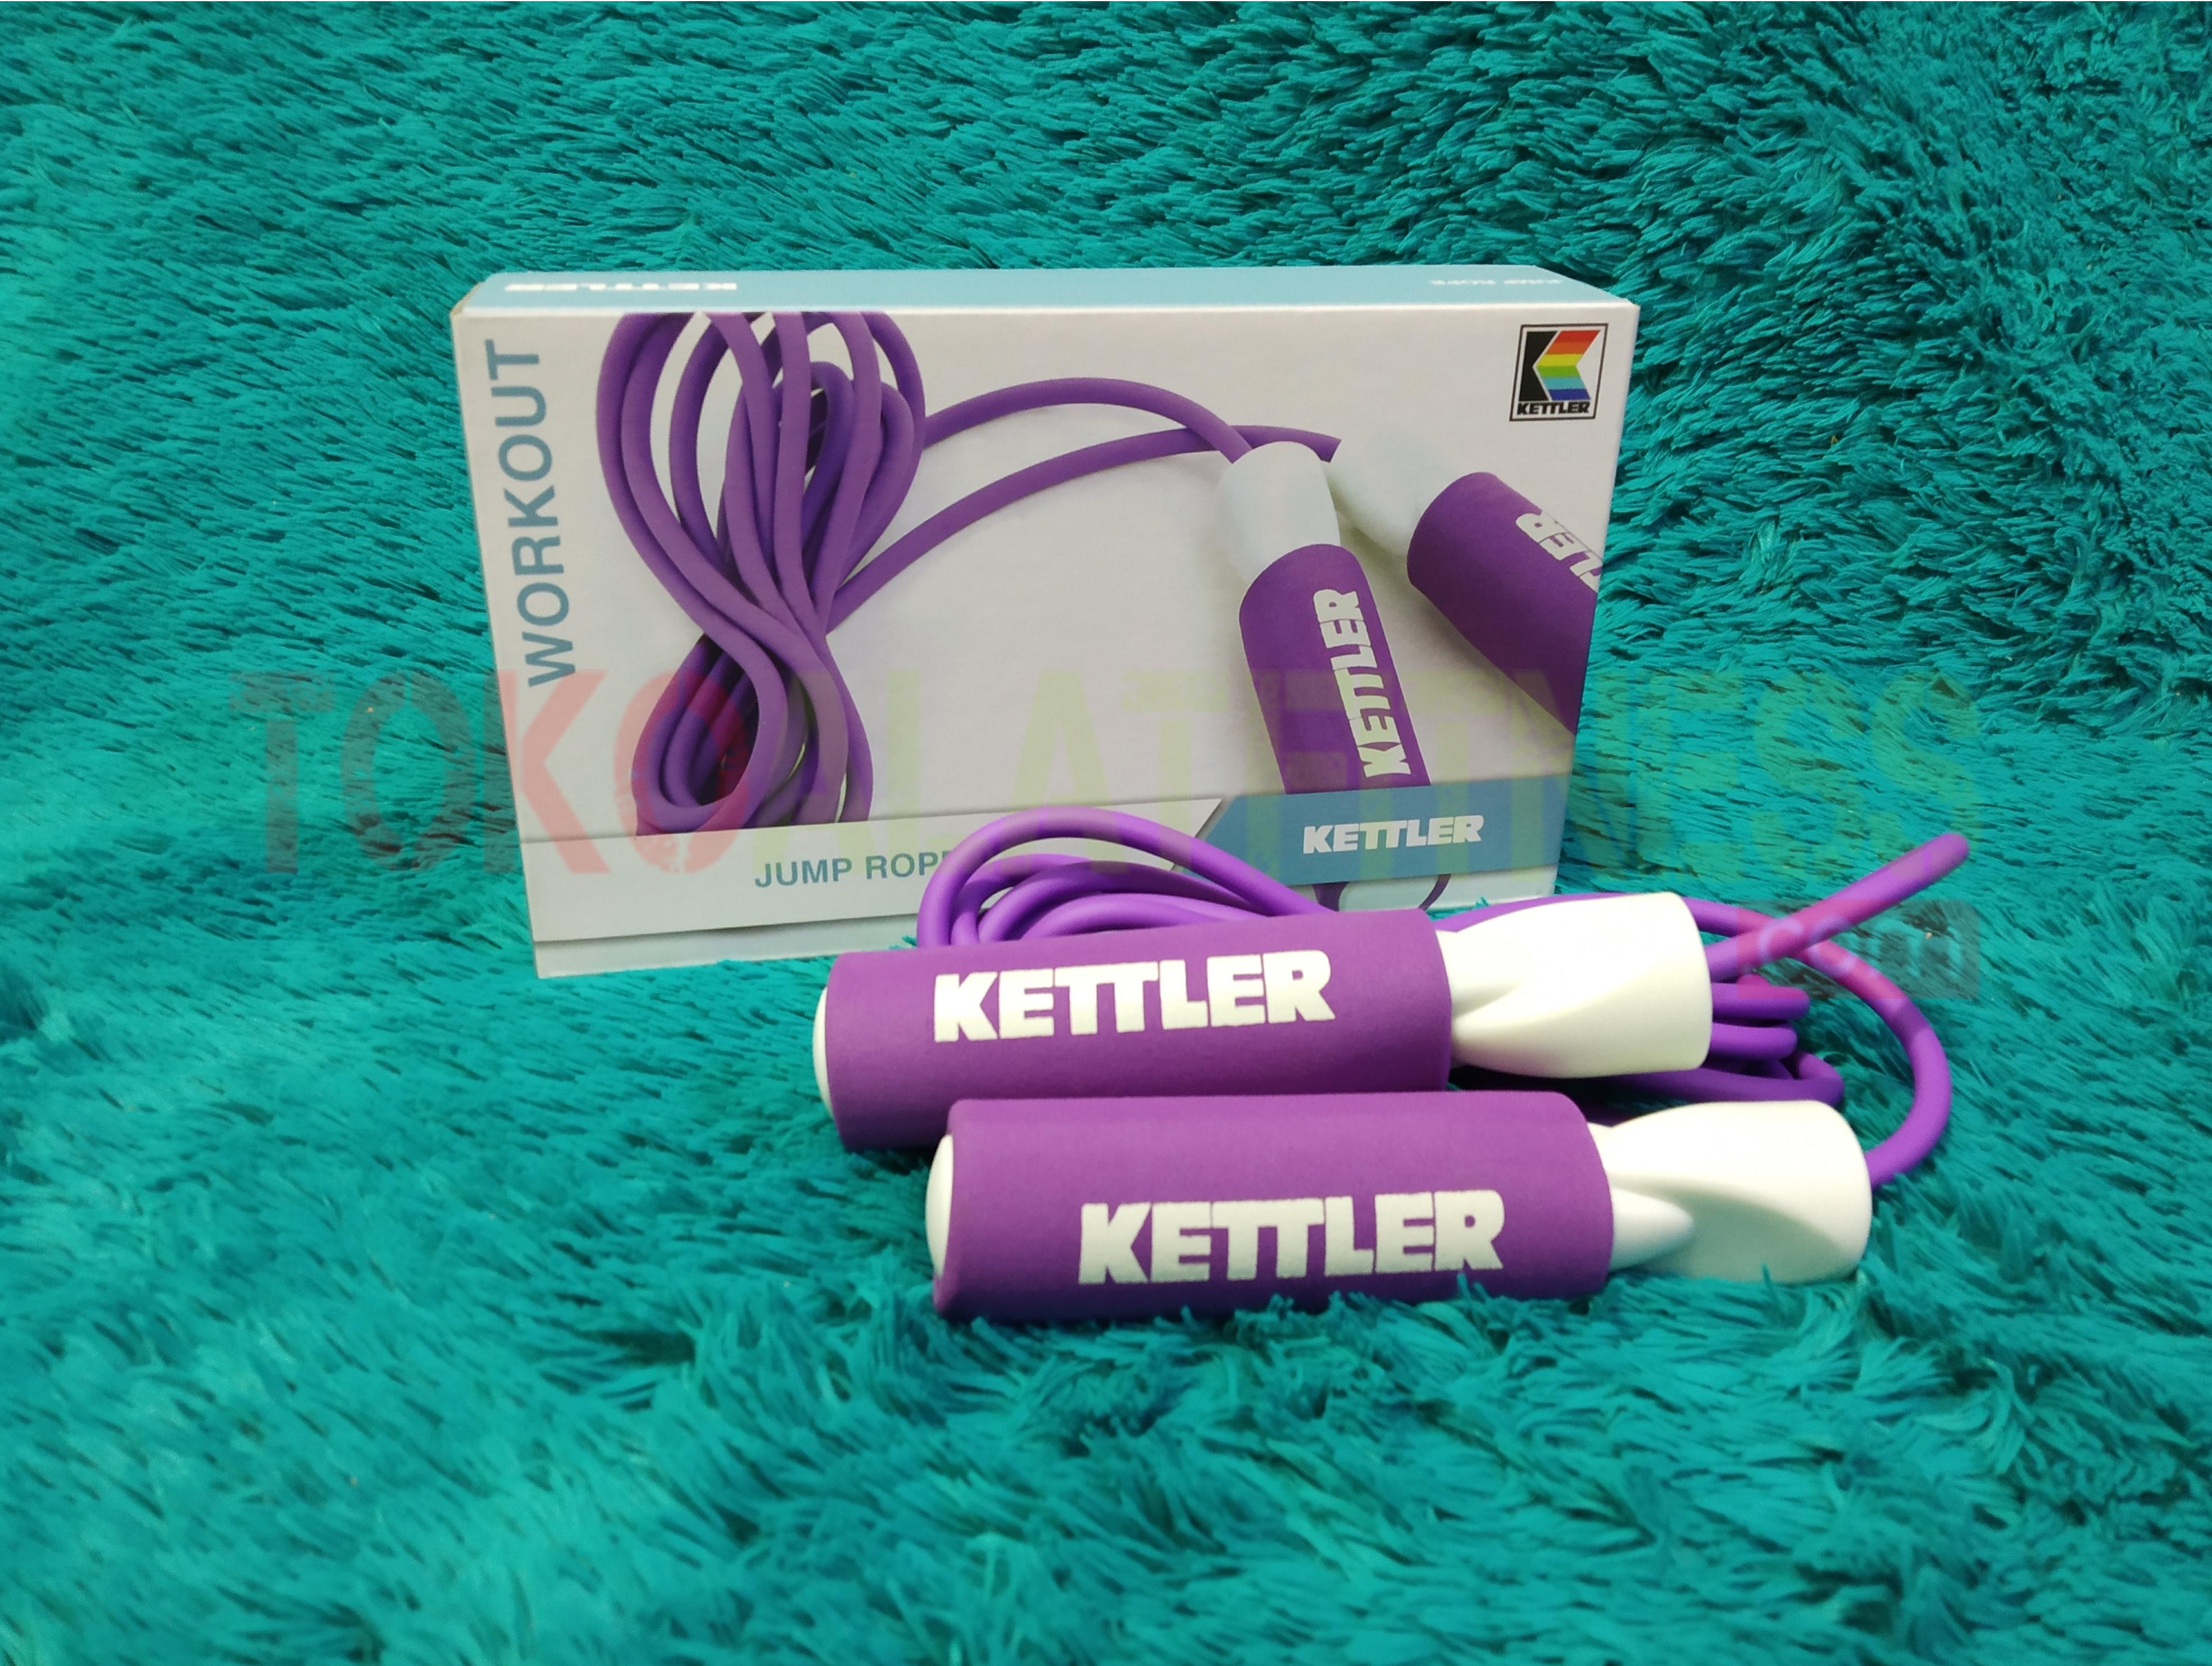 Kettler Jump Rope Ungu 3 wtm - Jump Rope Ungu Kettler